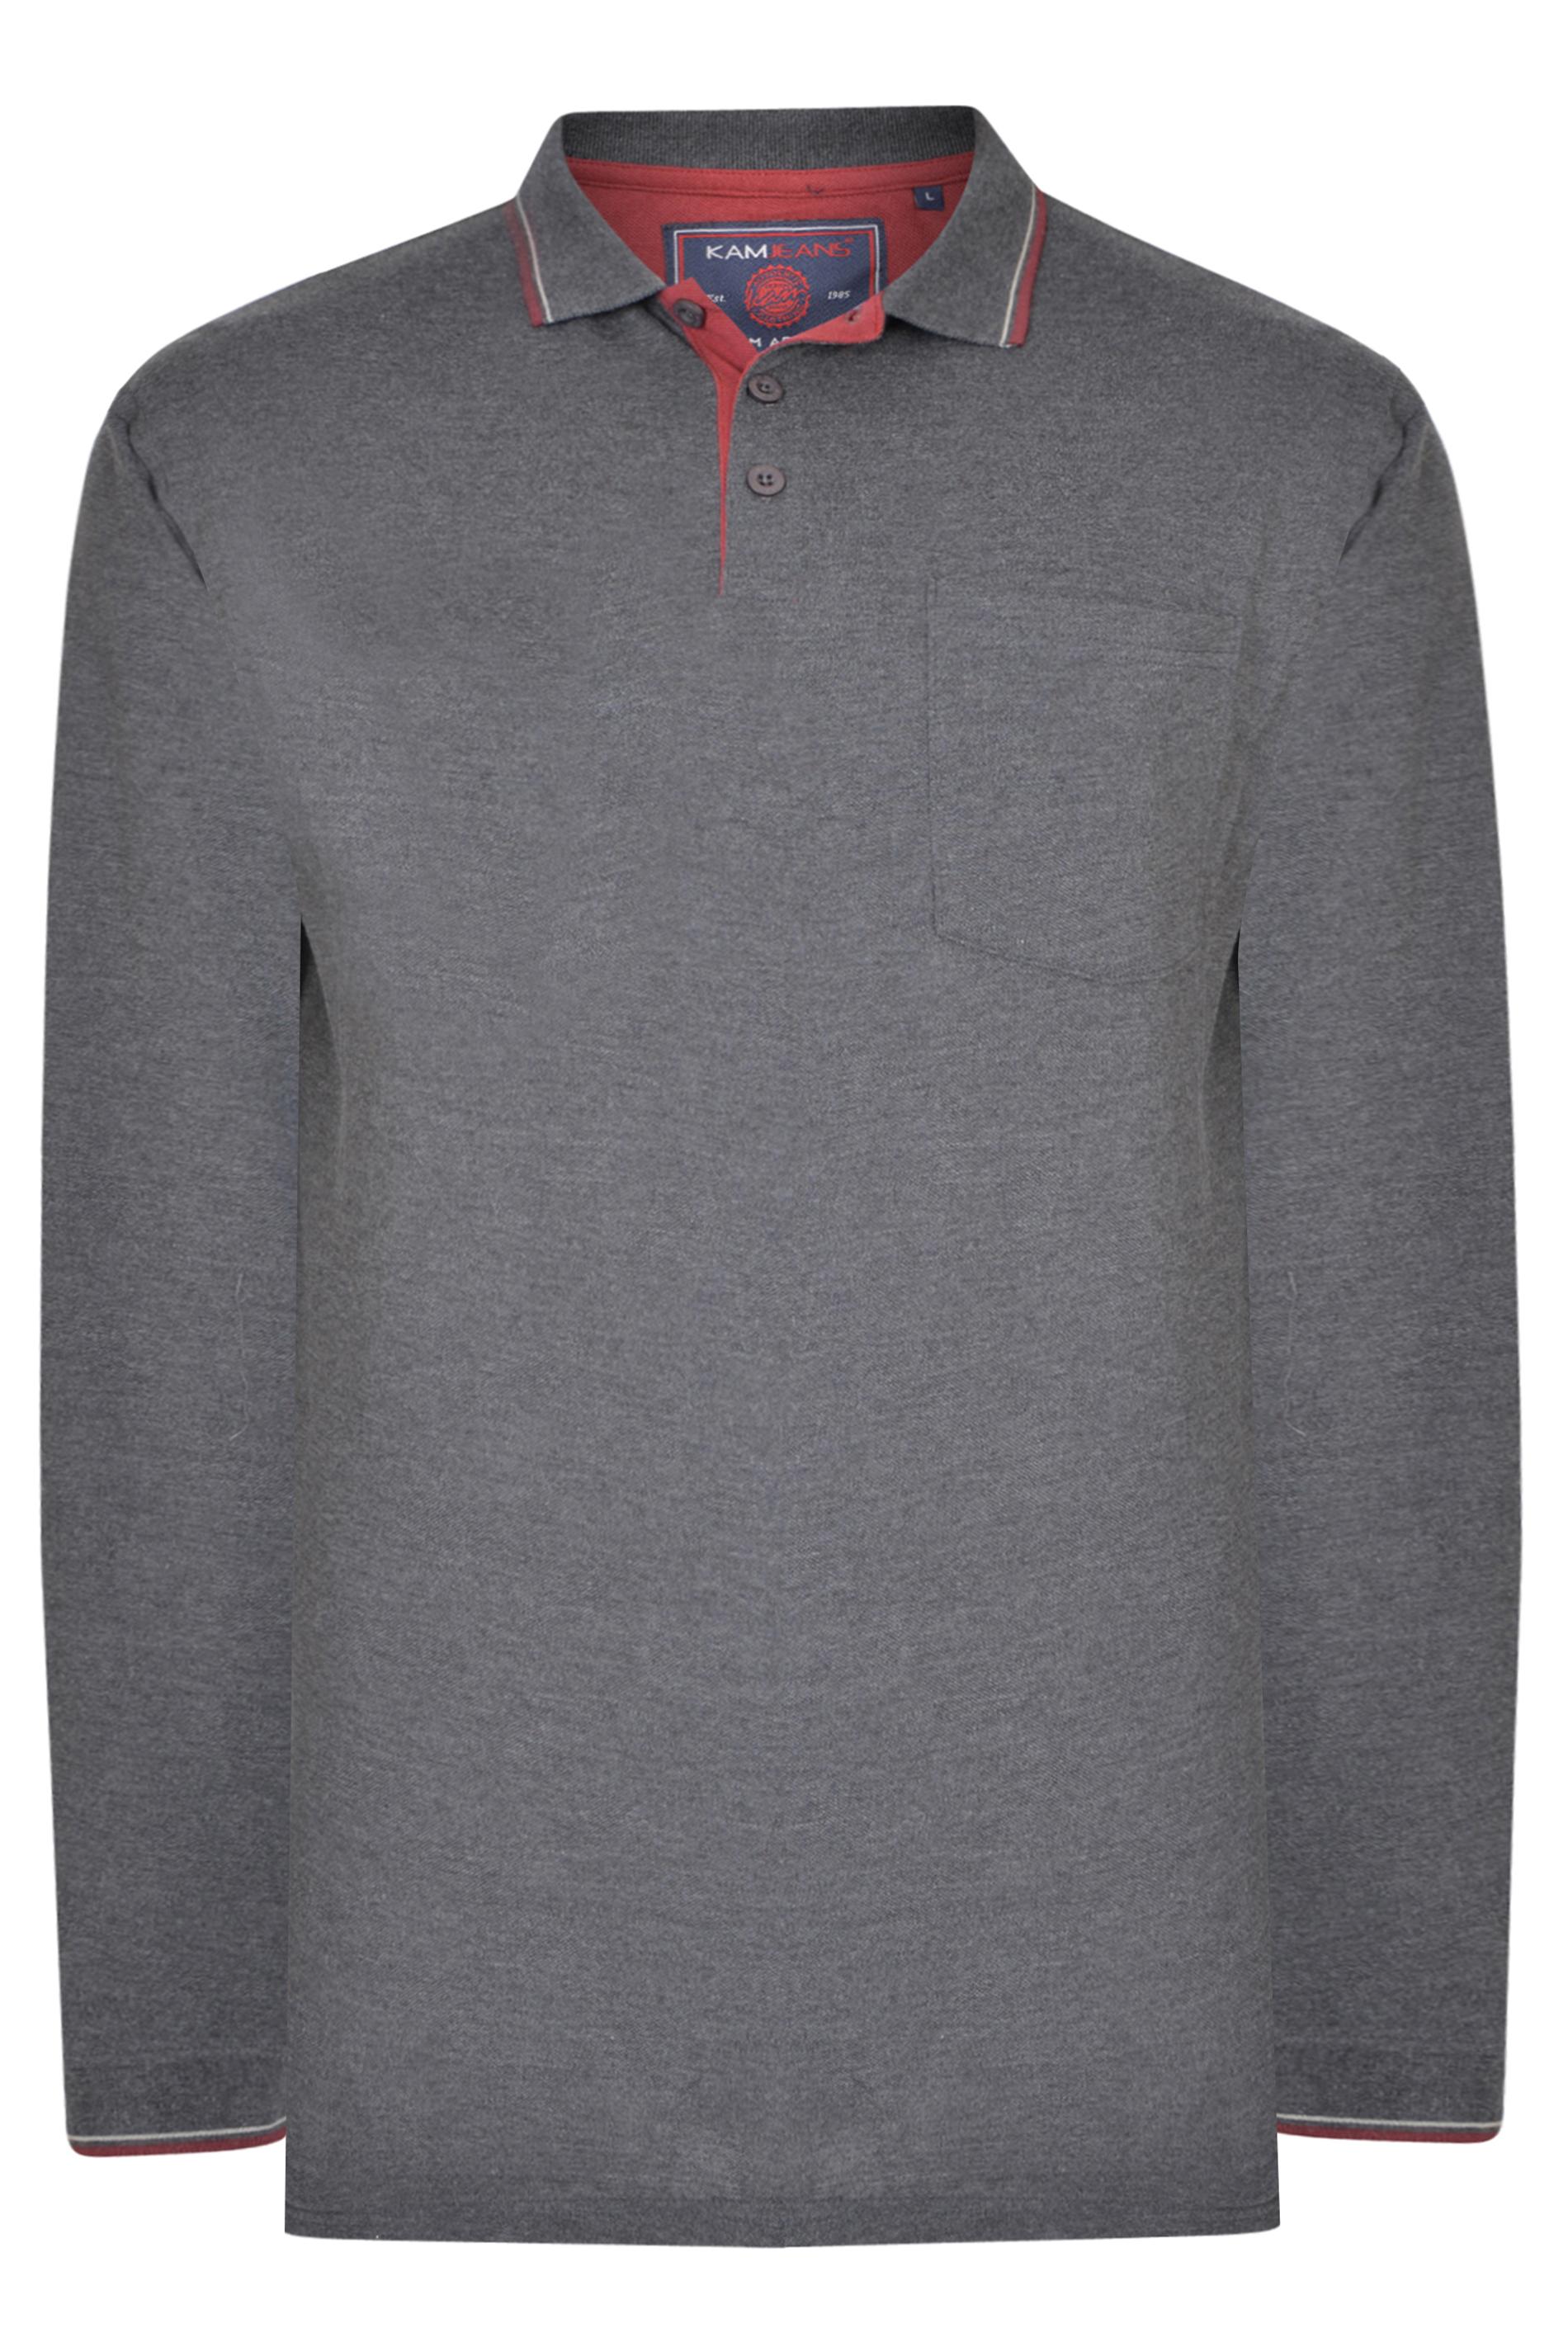 KAM Charcoal Grey Tipped Long Sleeve Polo